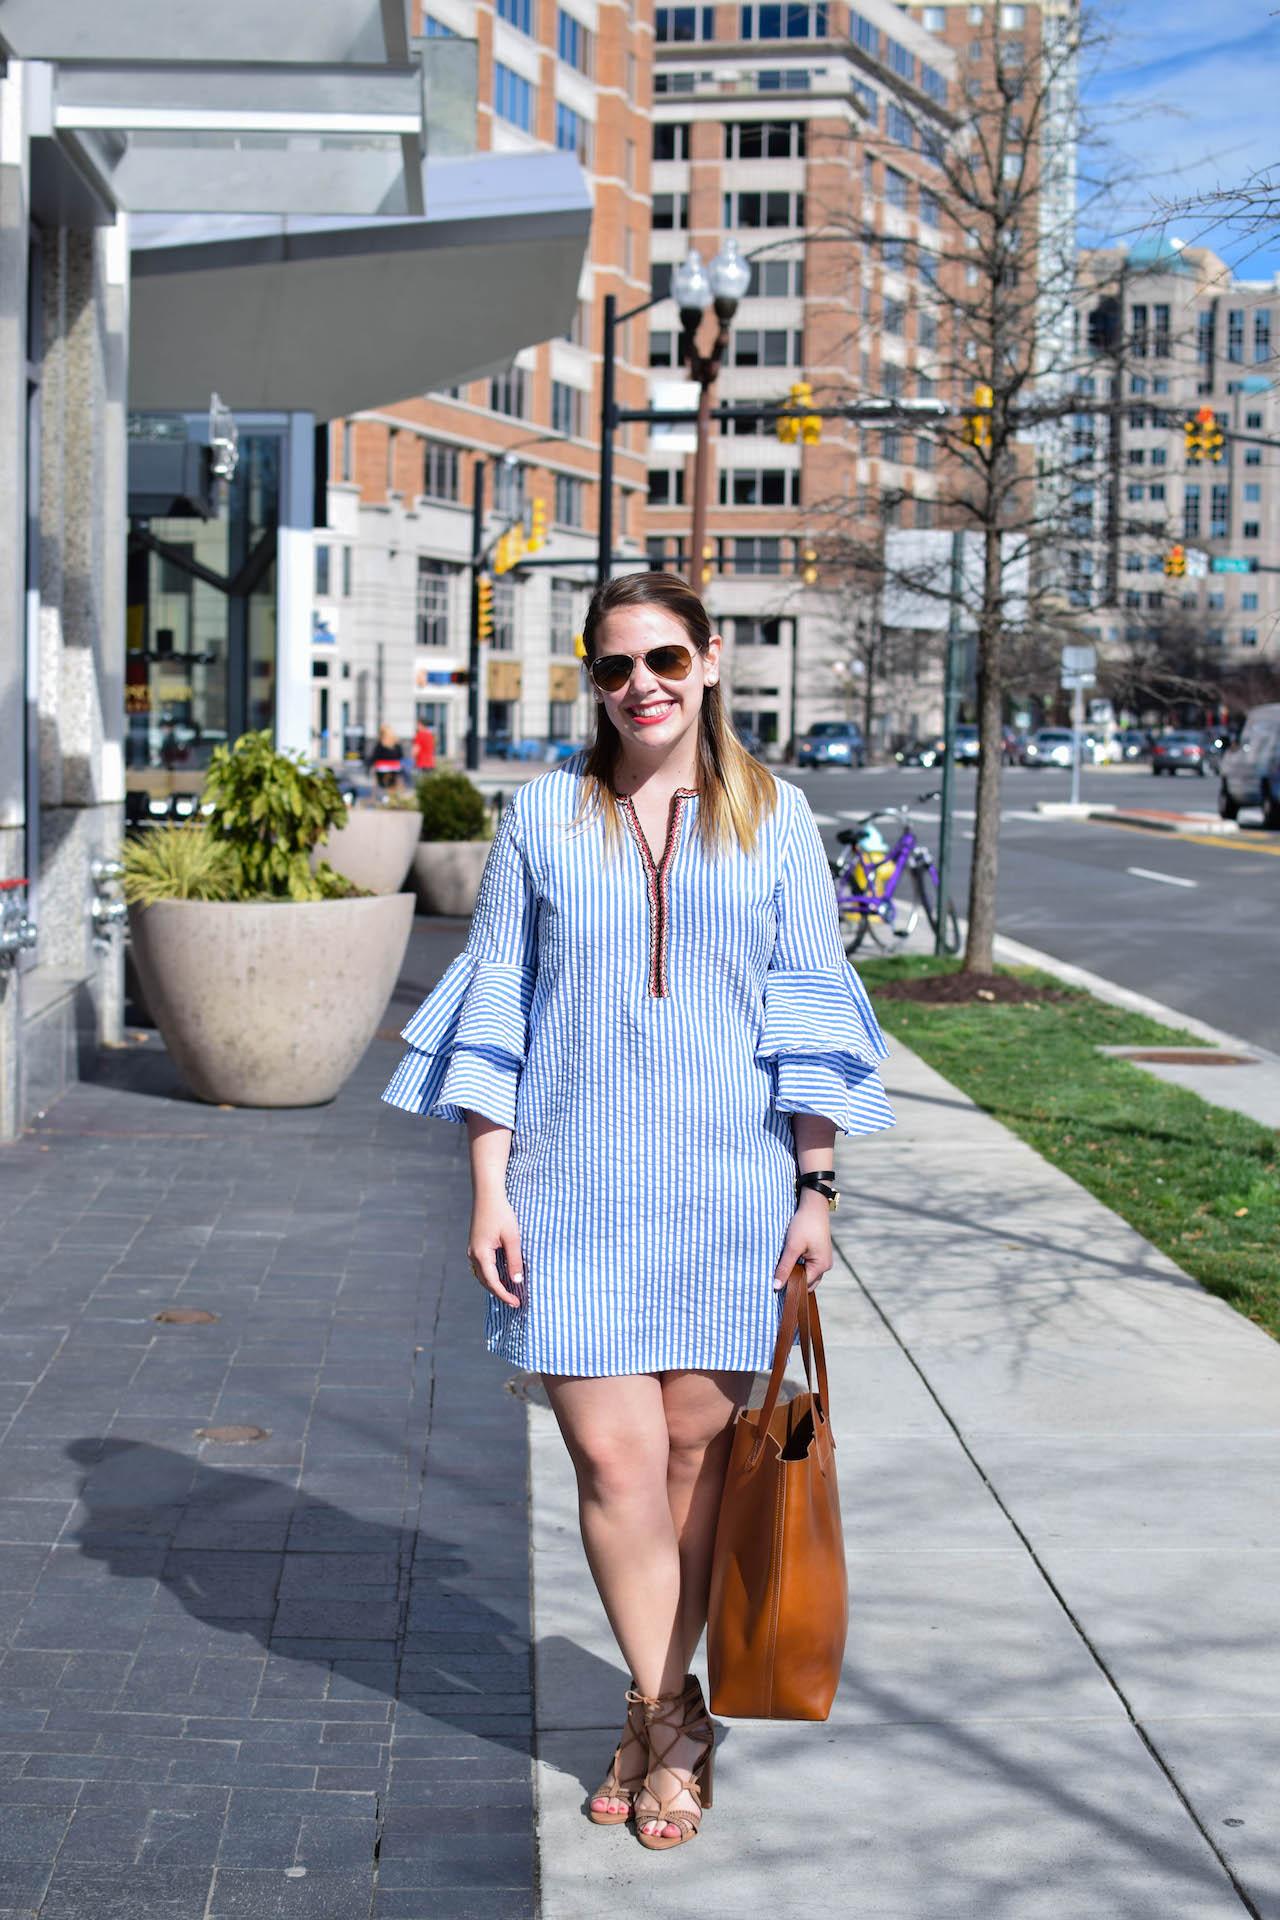 bell sleeves dress for spring